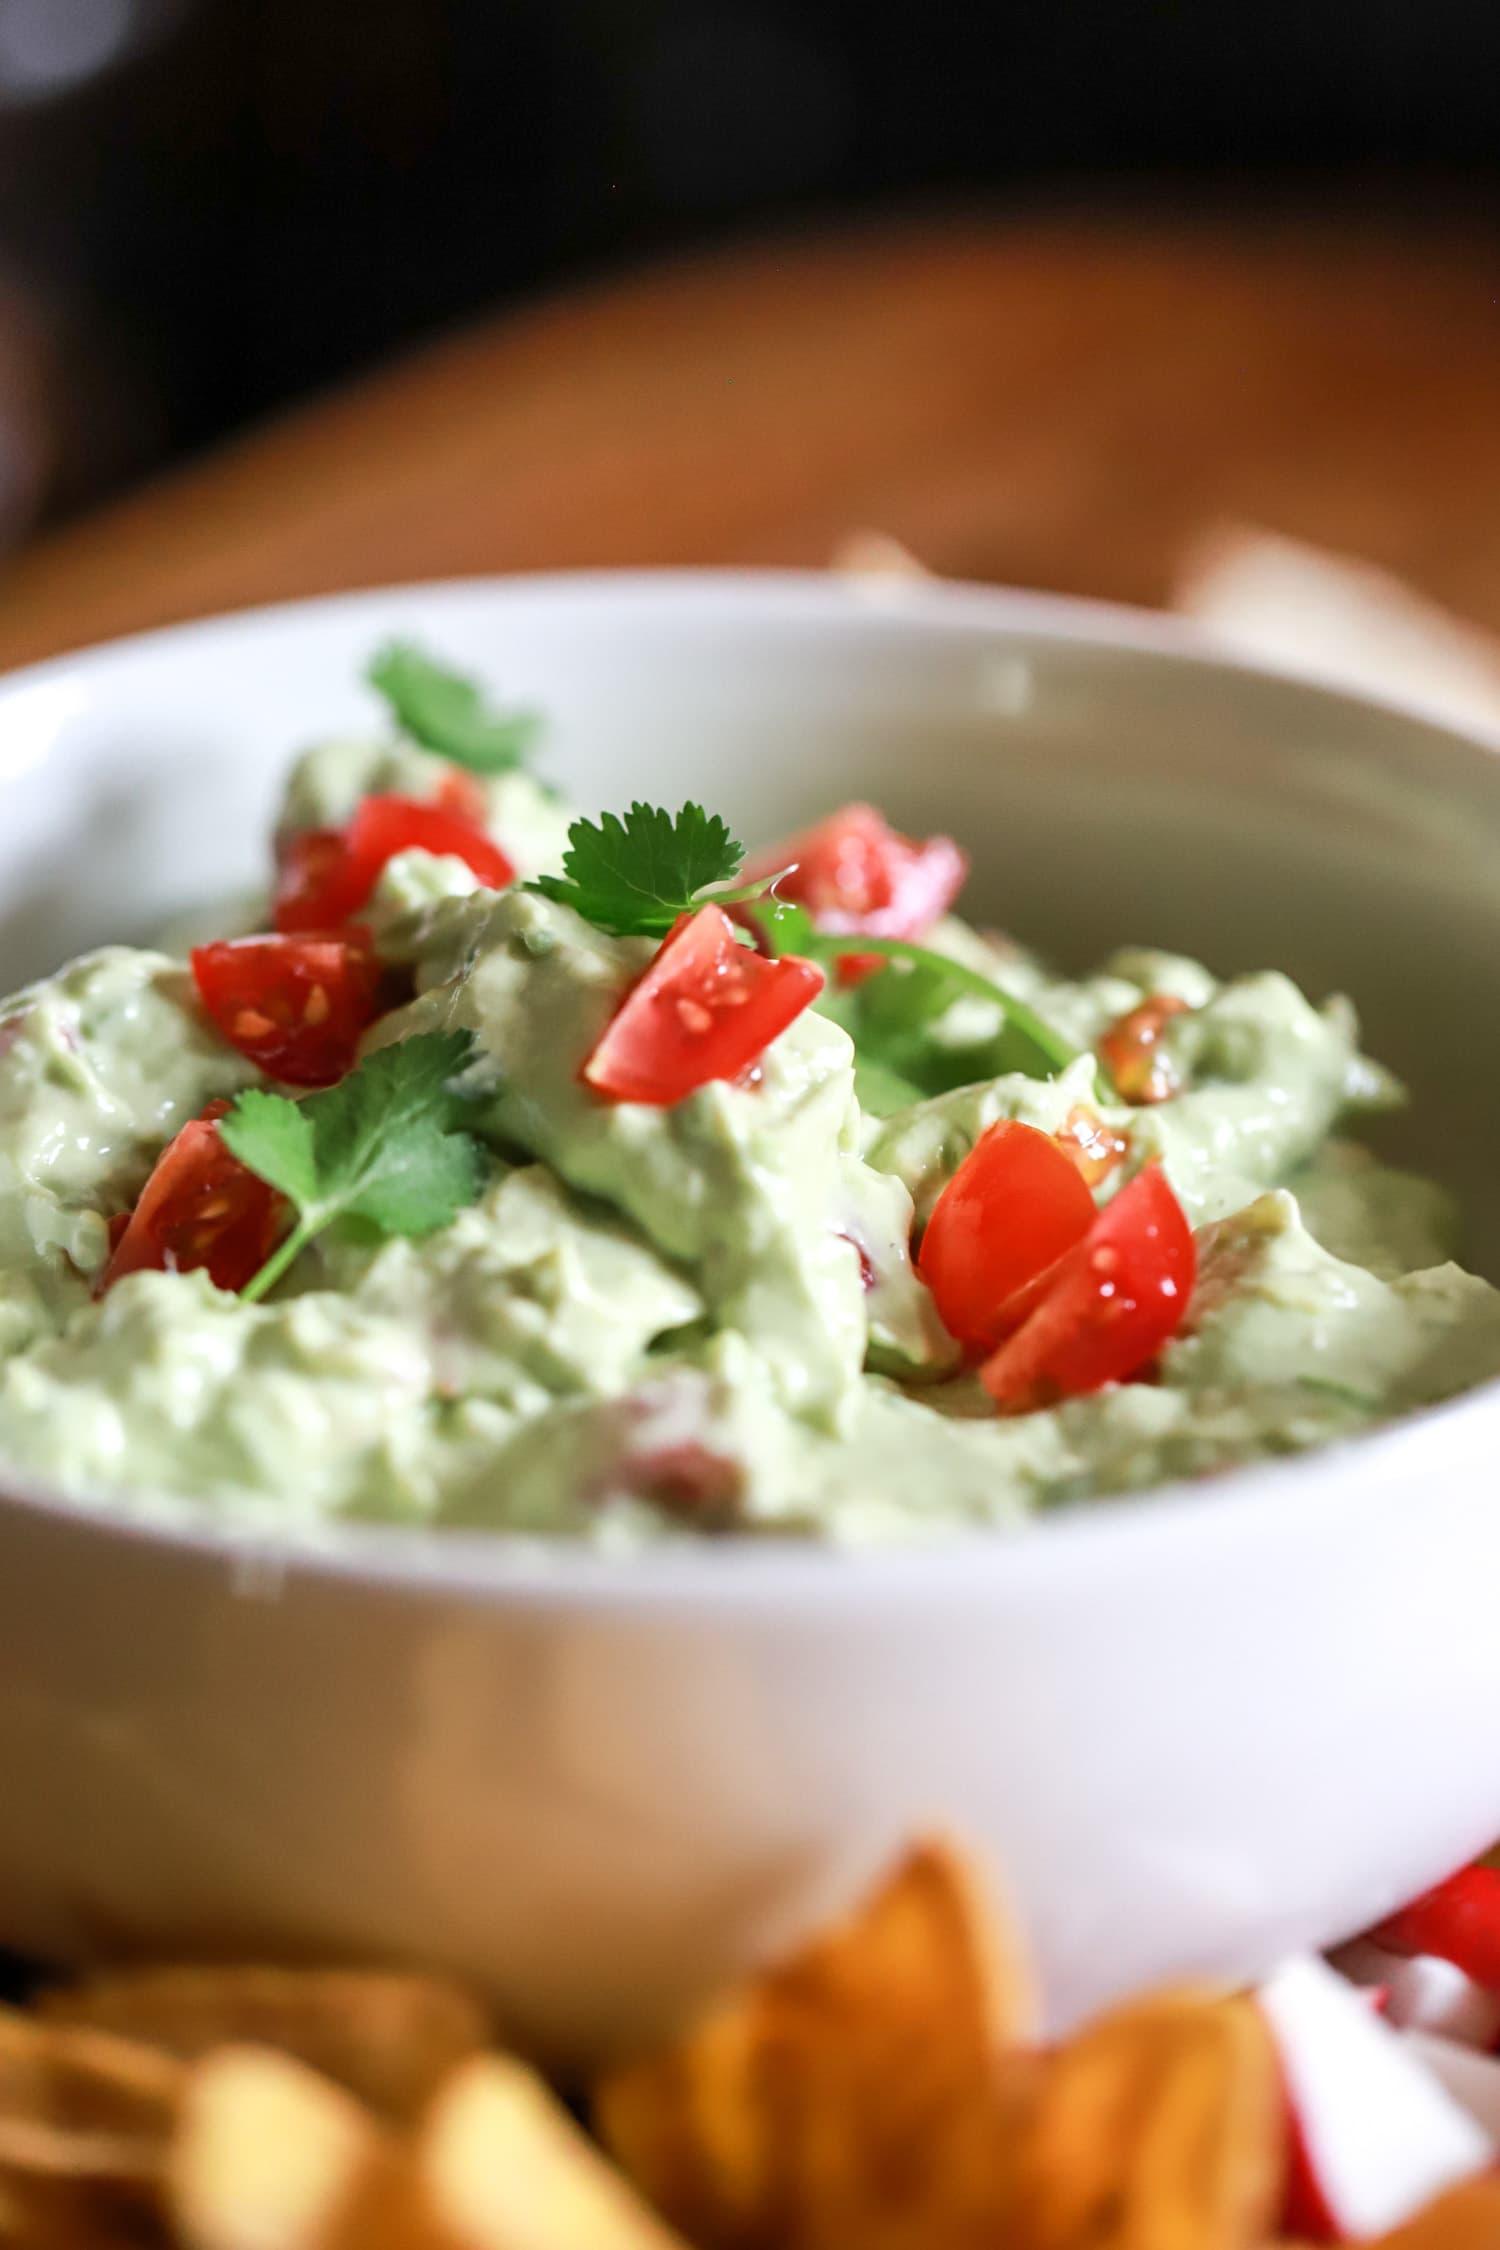 bowl of sour cream guacamole